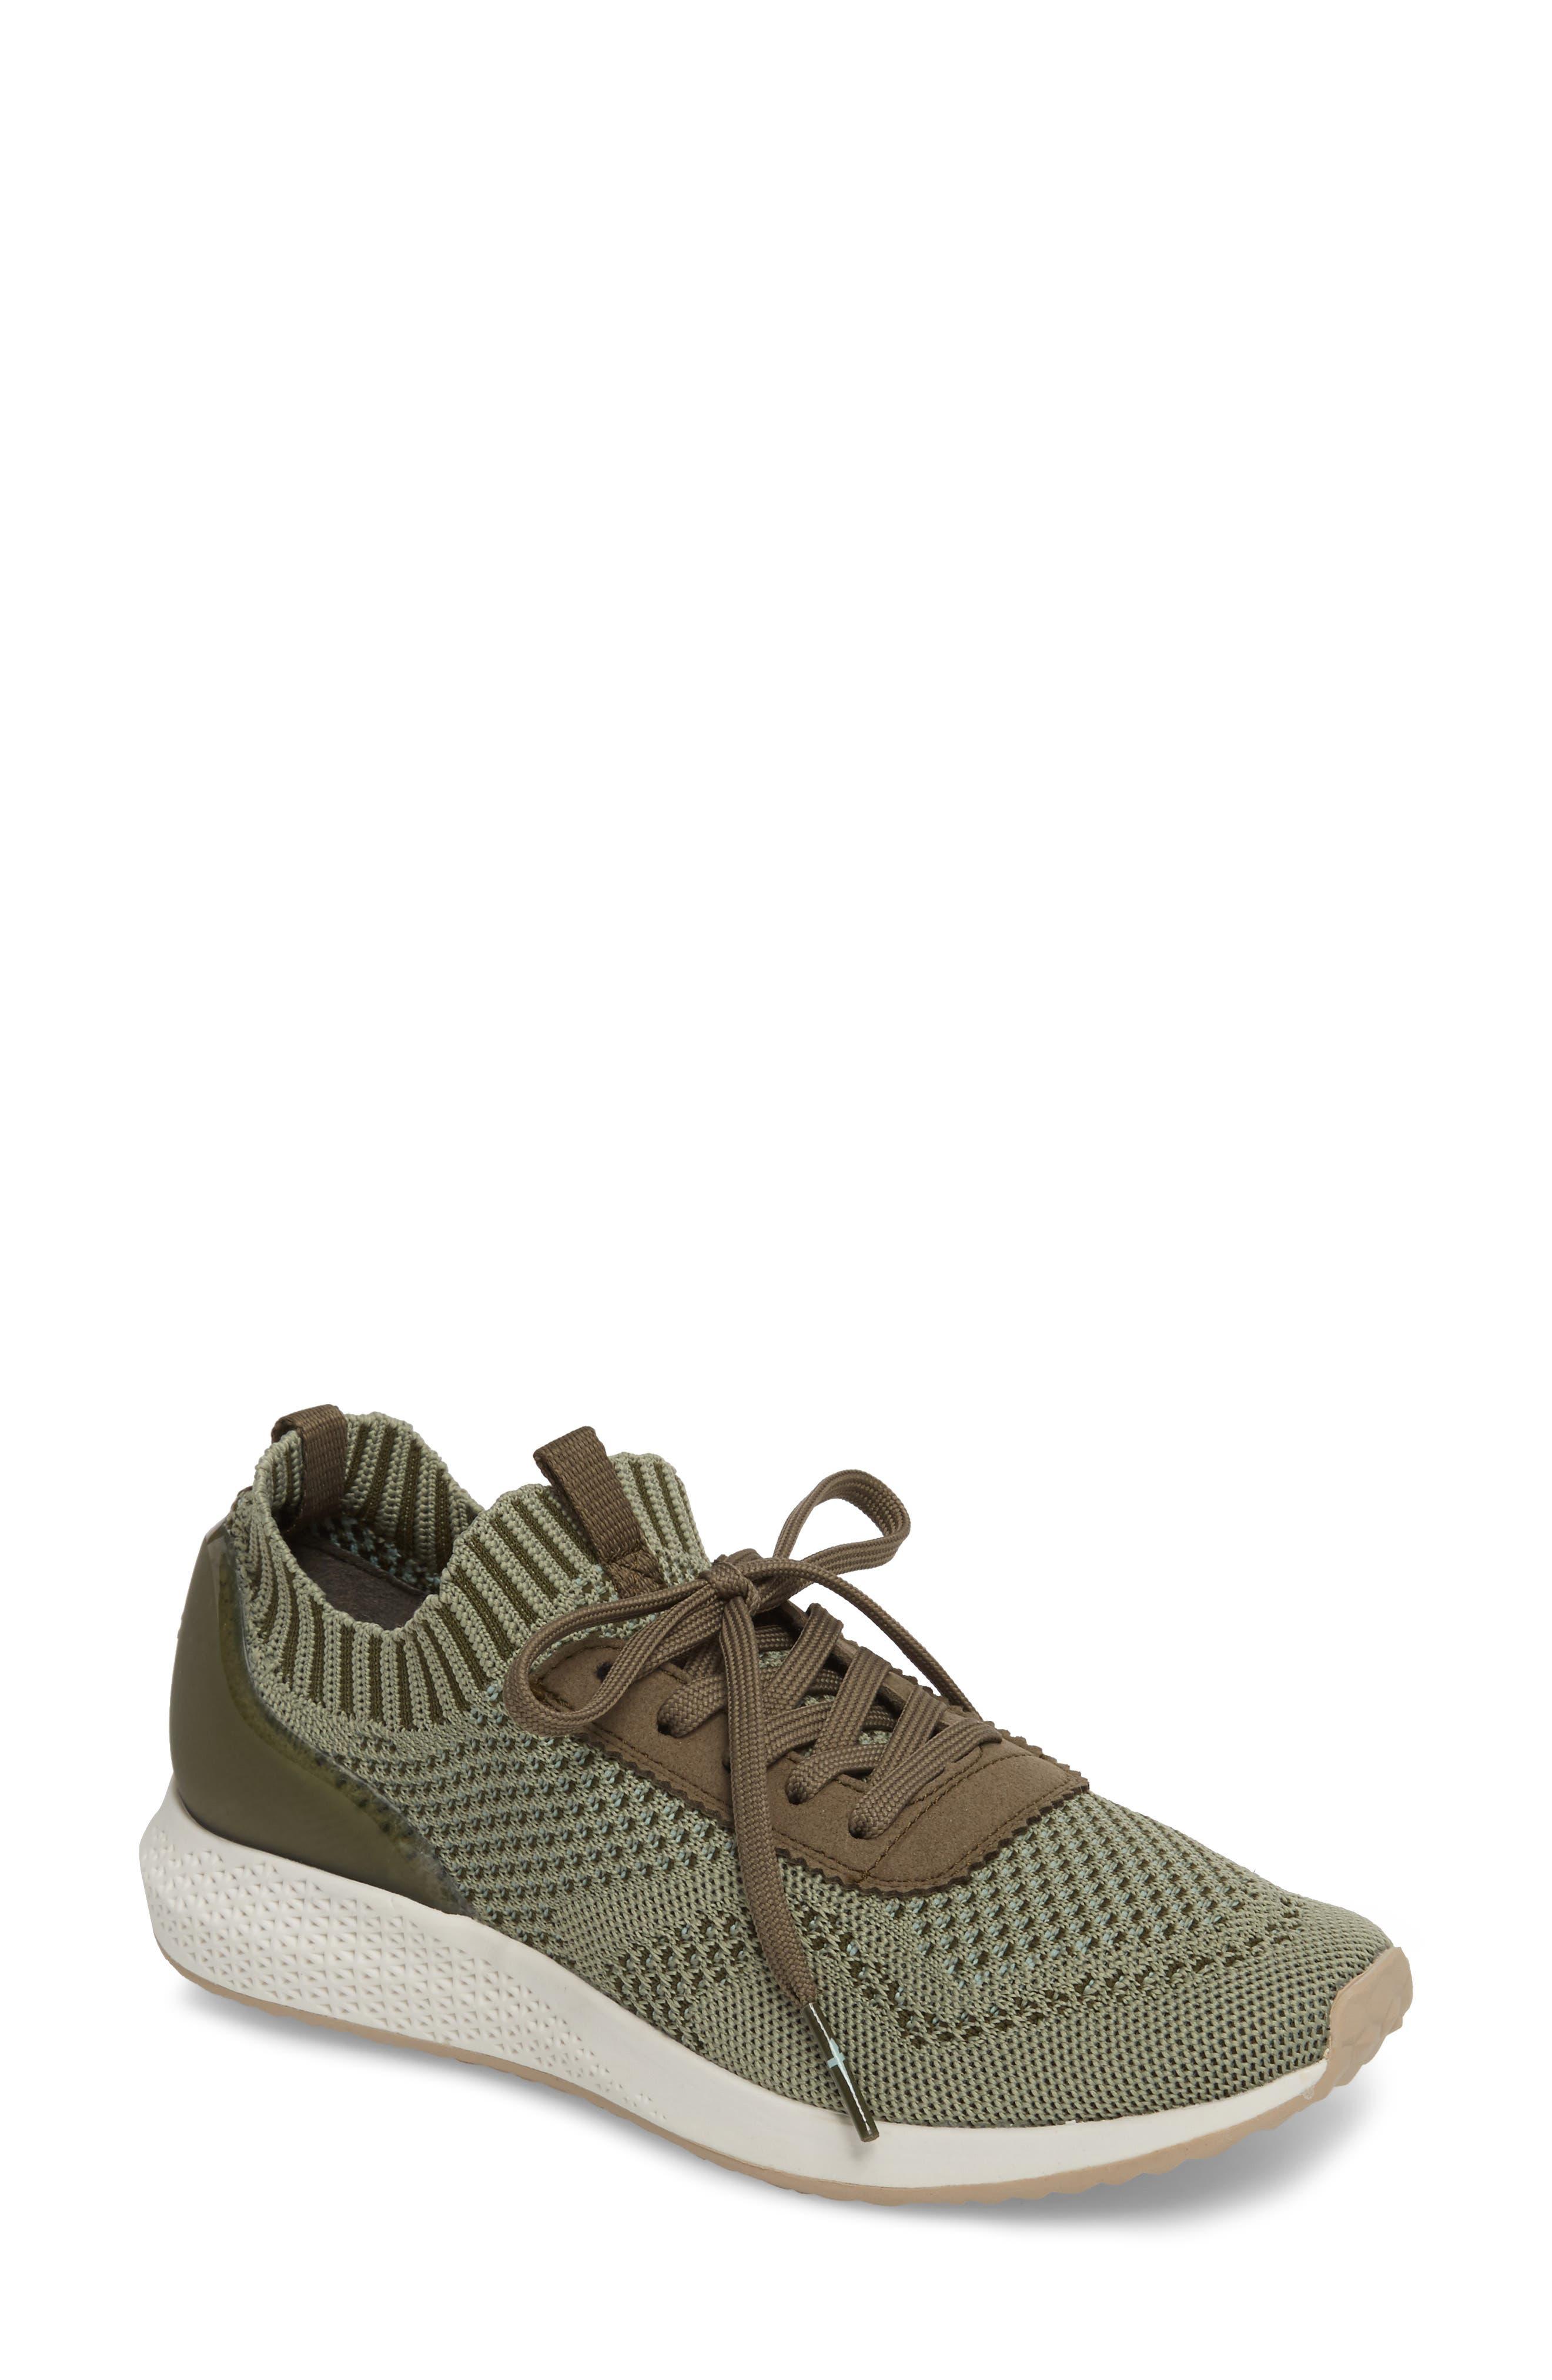 Tavia Sneaker,                         Main,                         color,